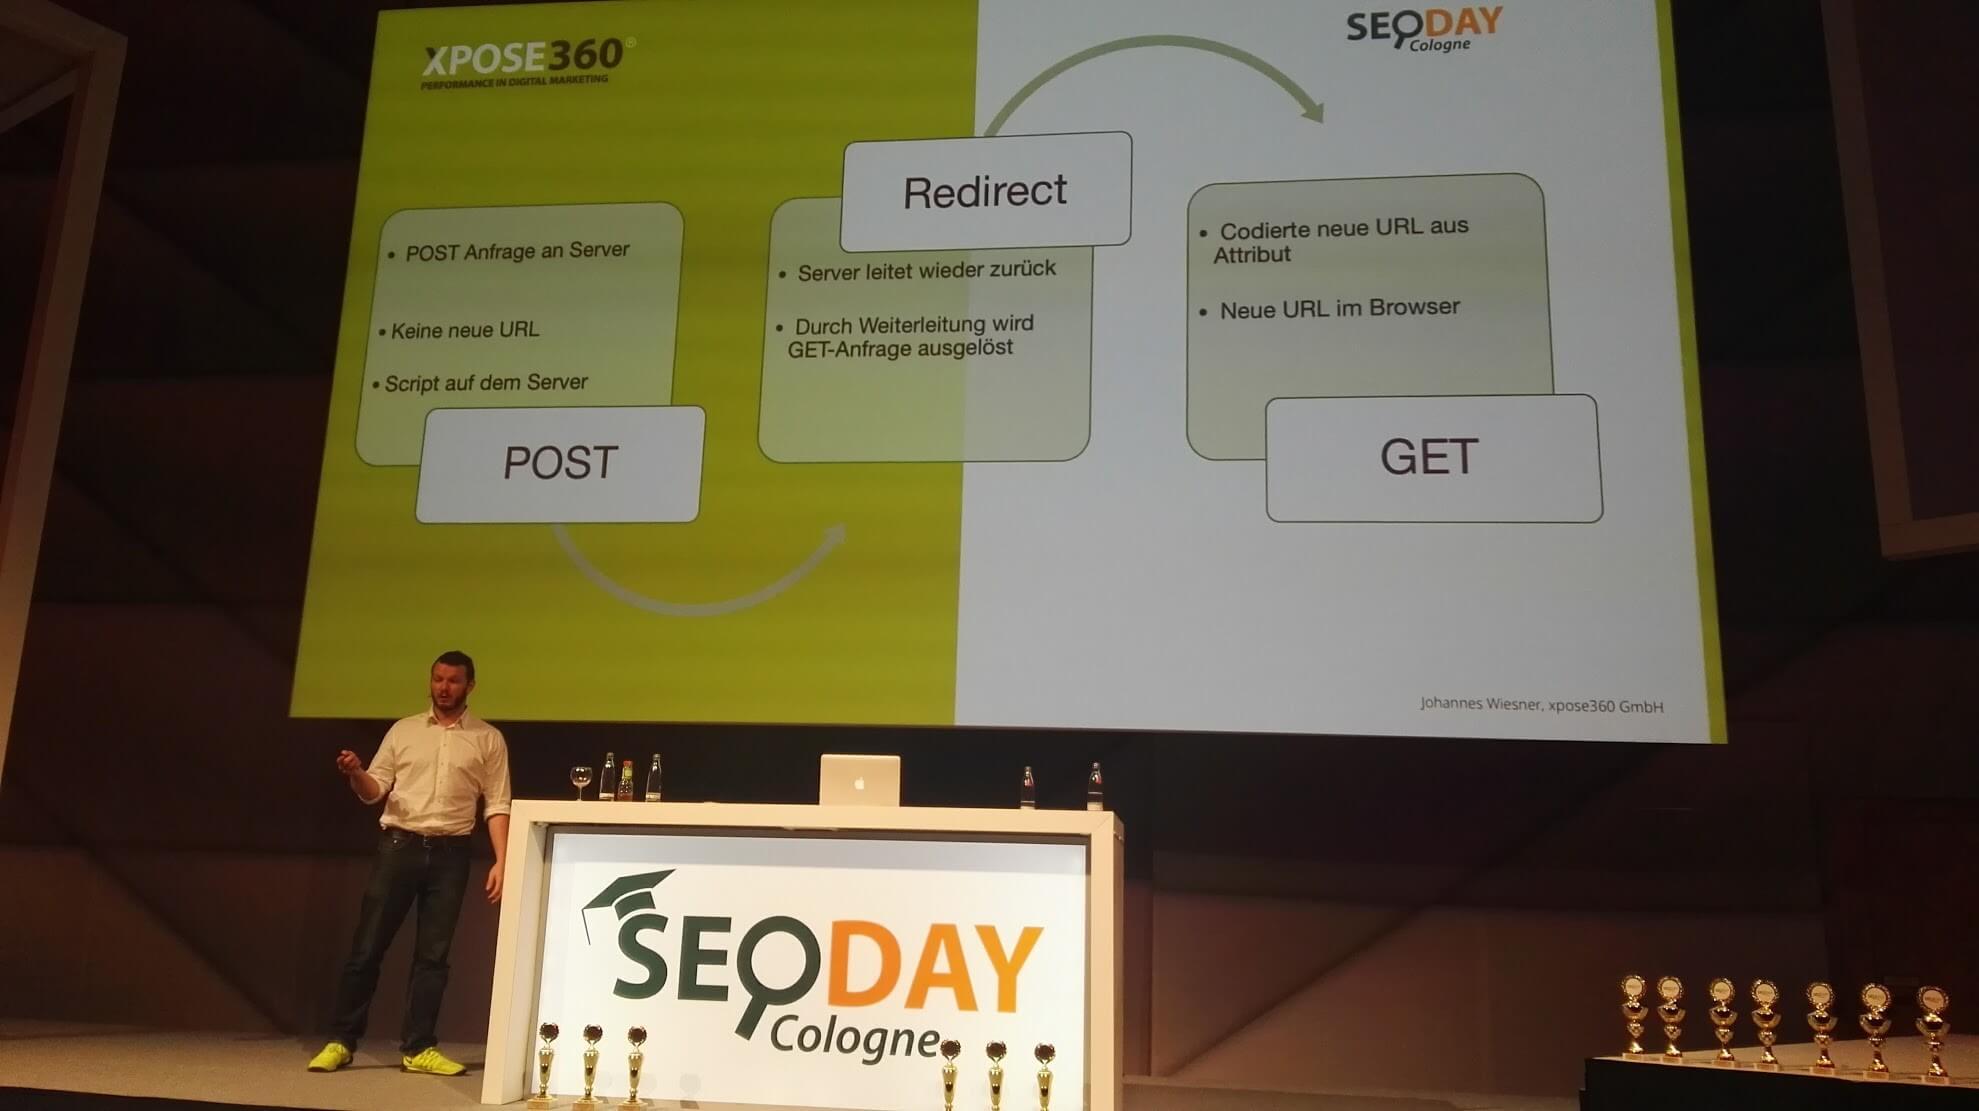 SEO Day 2016 Recap - xpose360 GmbH